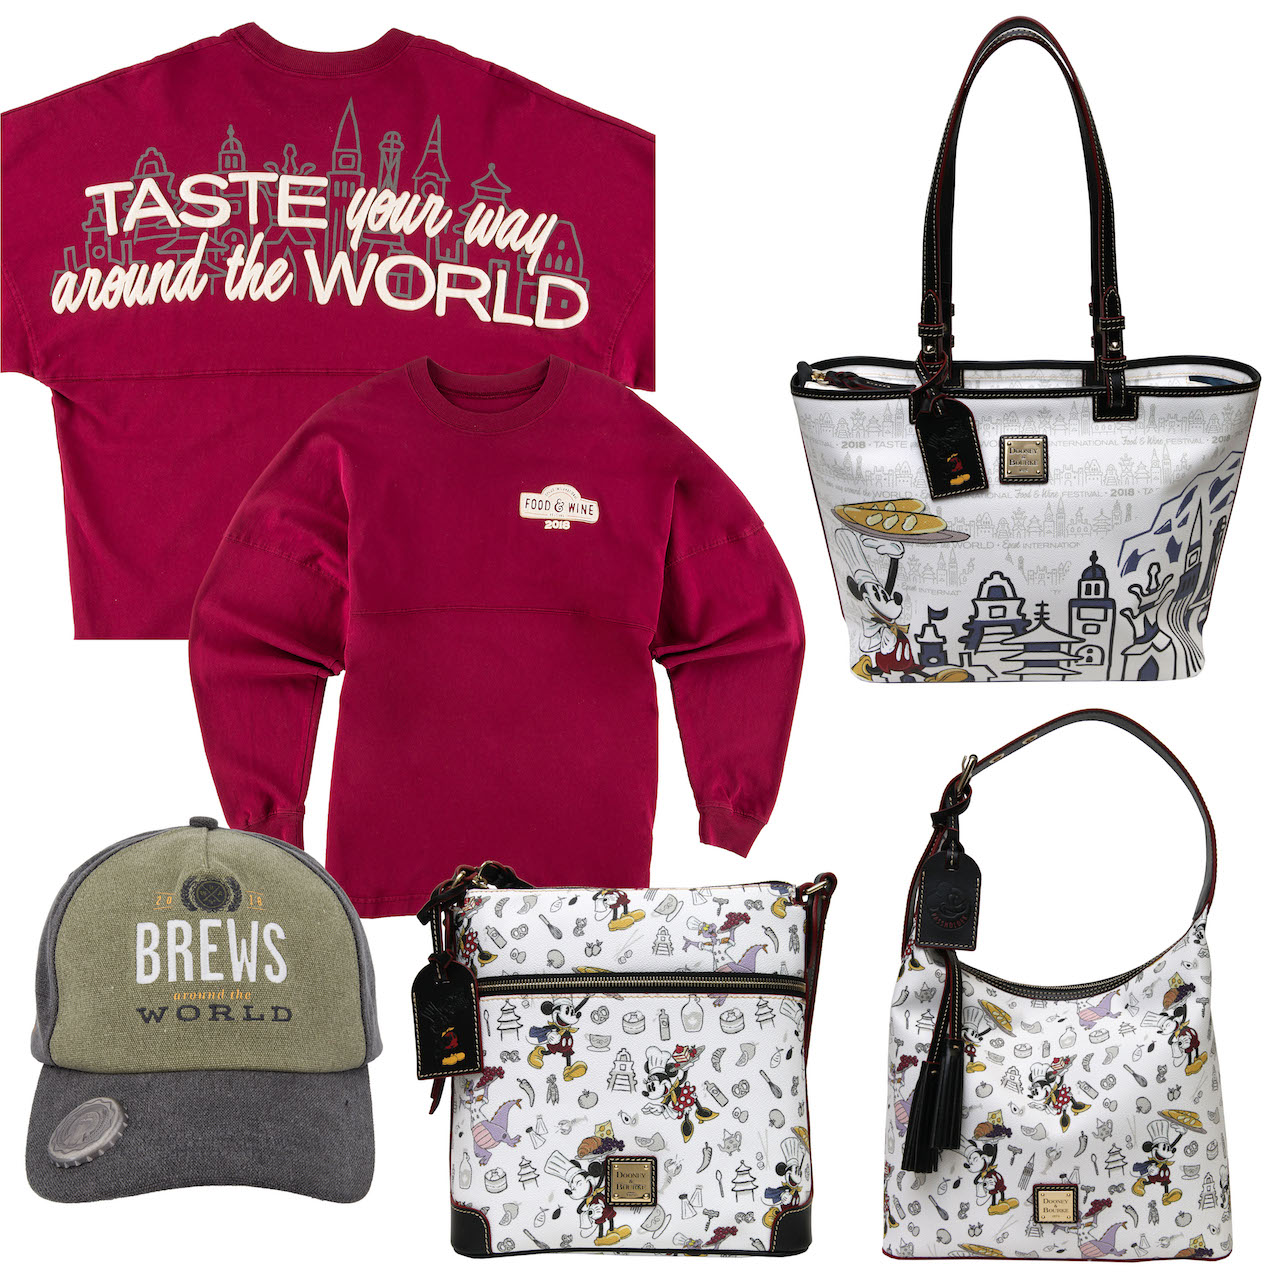 Food & Wine Merchandise